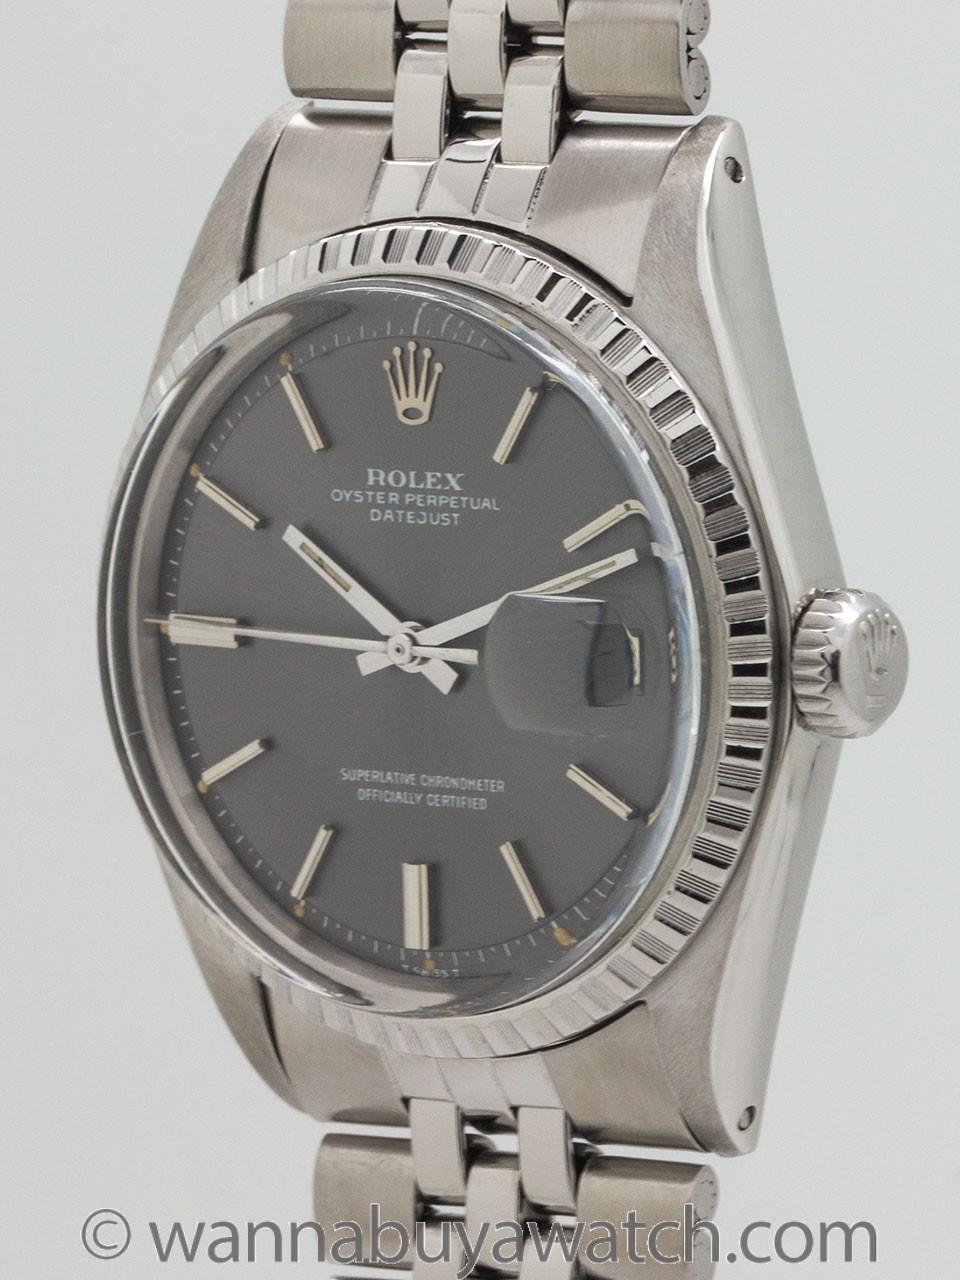 Rolex SS Datejust ref 1603 circa 1968